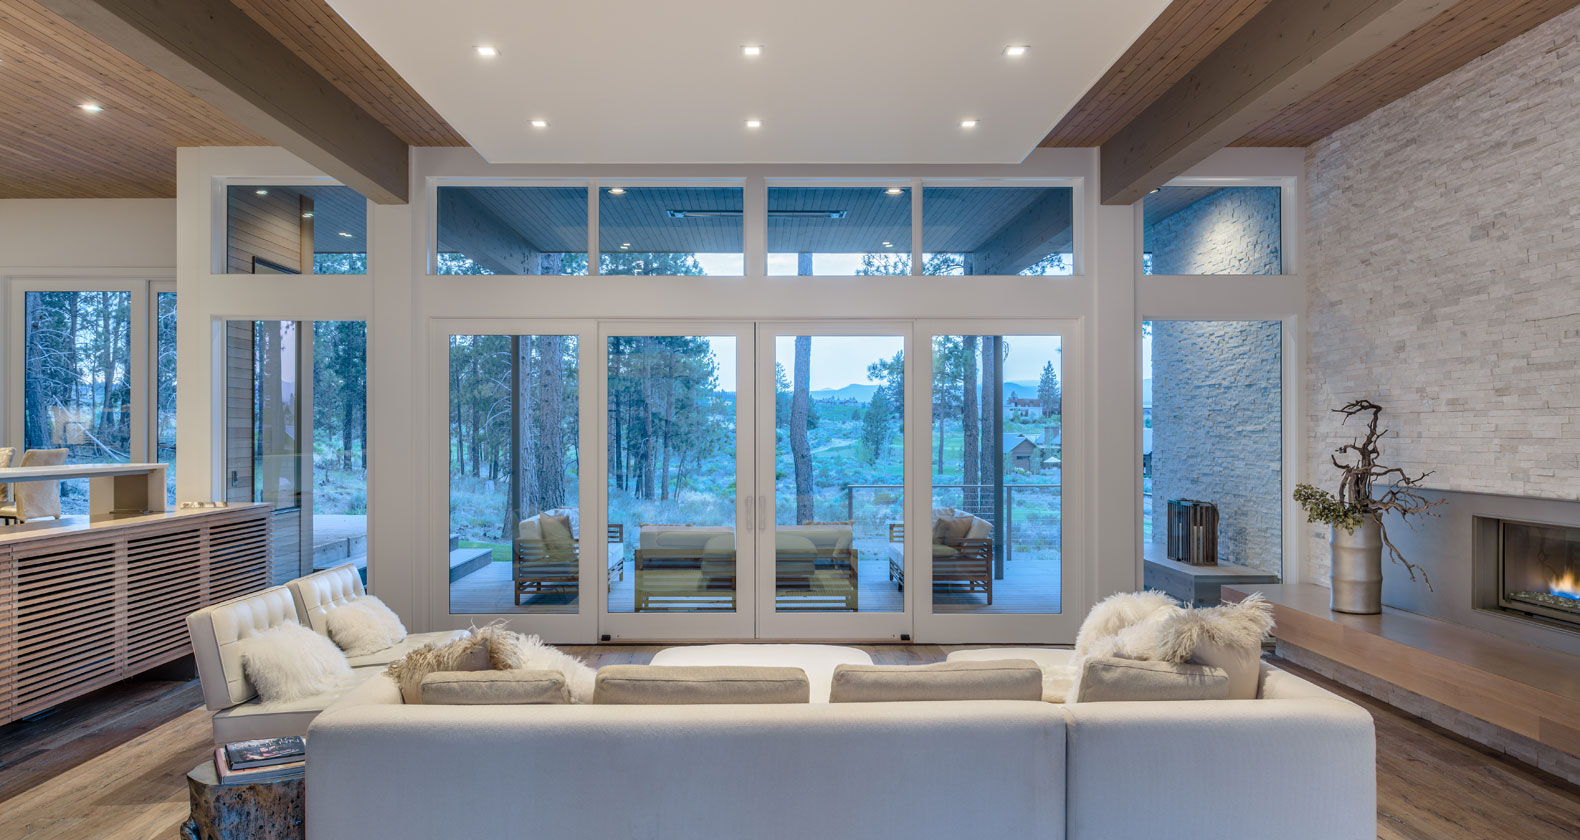 window wall Pella modern architecture bend oregon tetherow golf dream home steel bridge mountain bike outdoor living